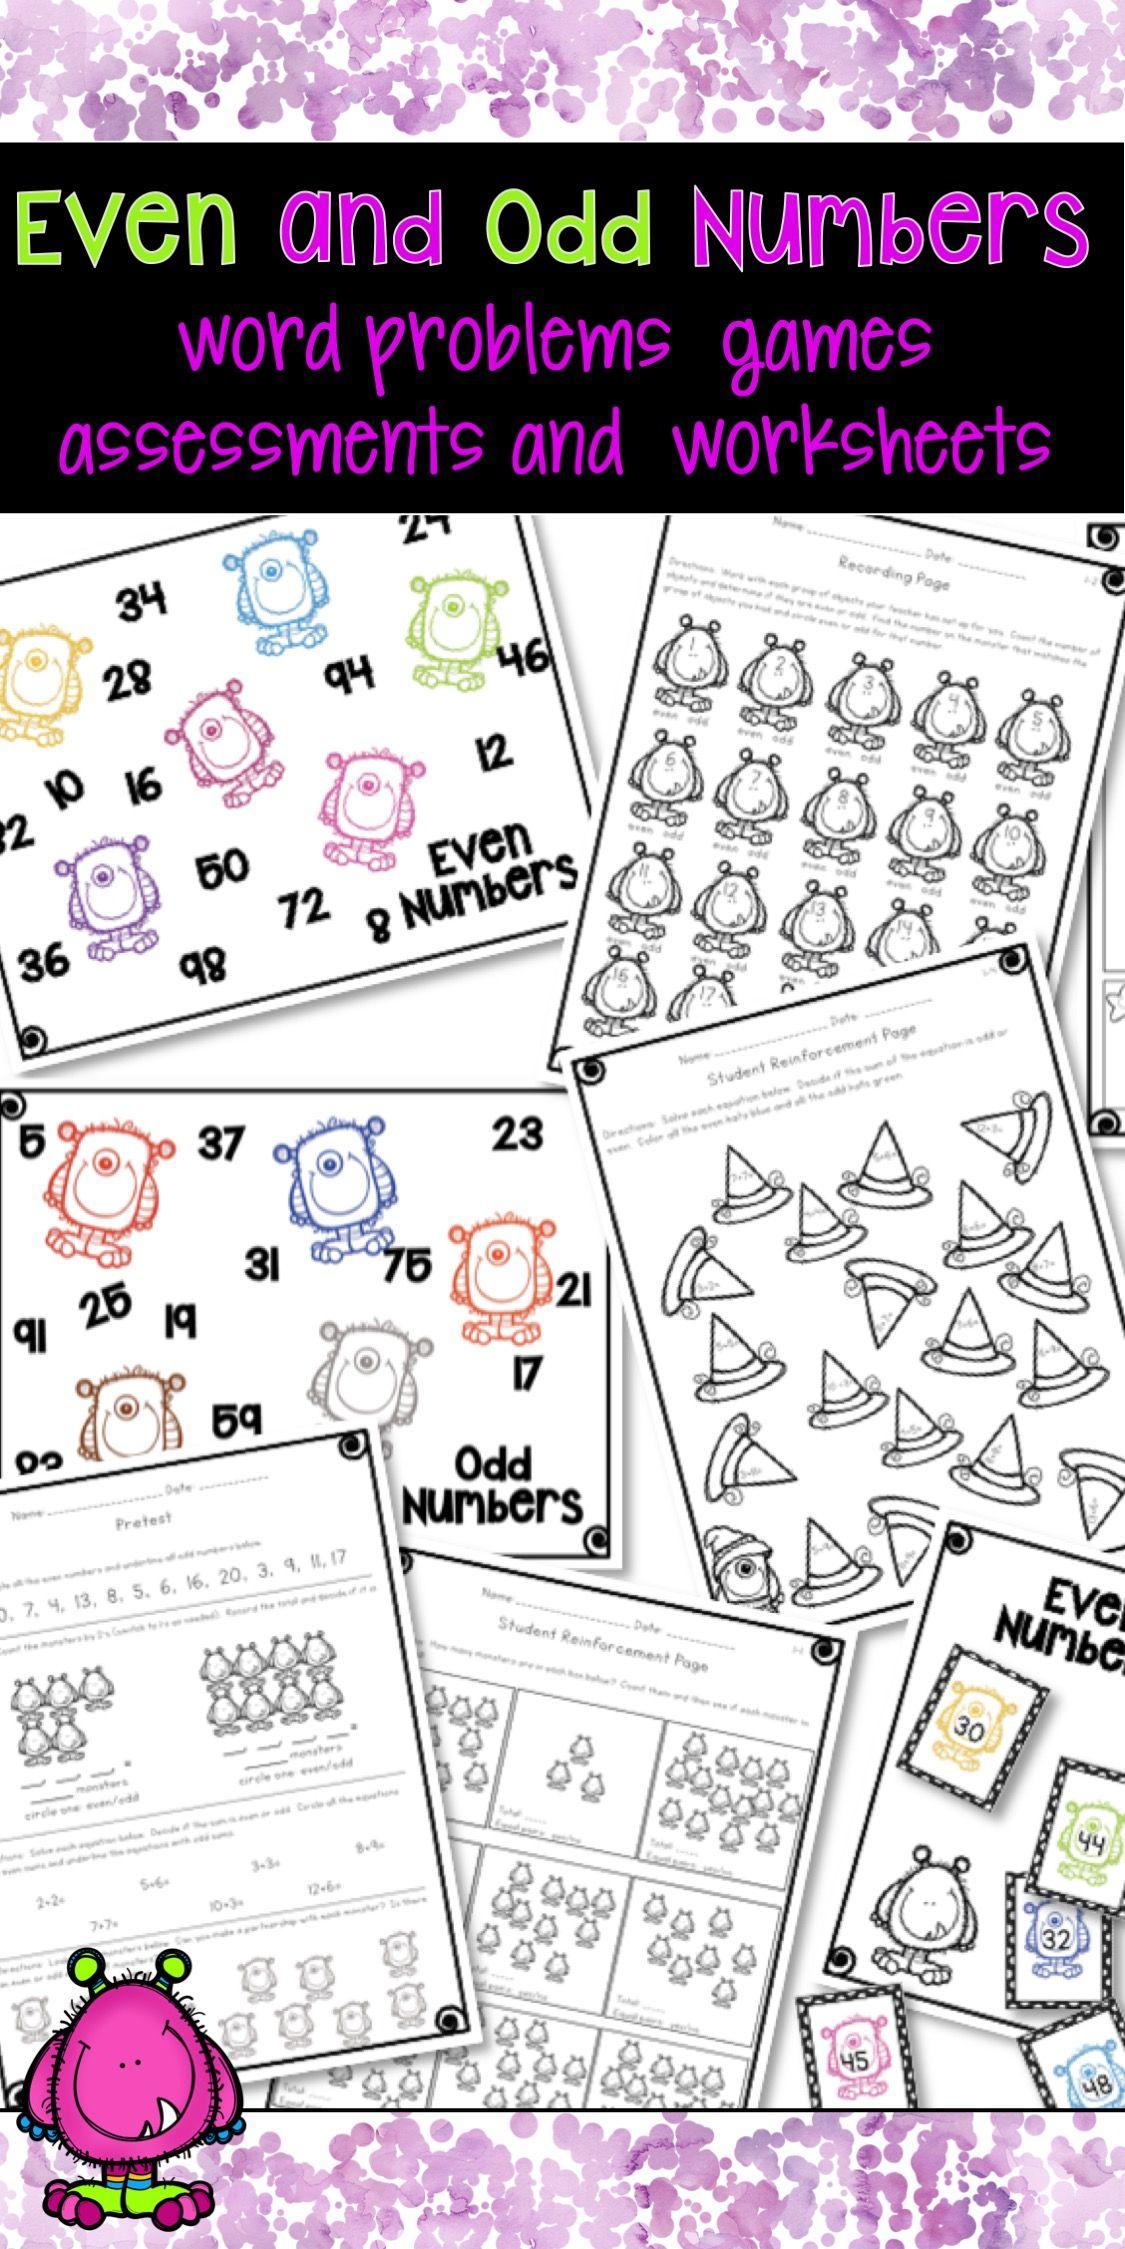 12 Best Unit Worksheets Images On Best Worksheets Collection